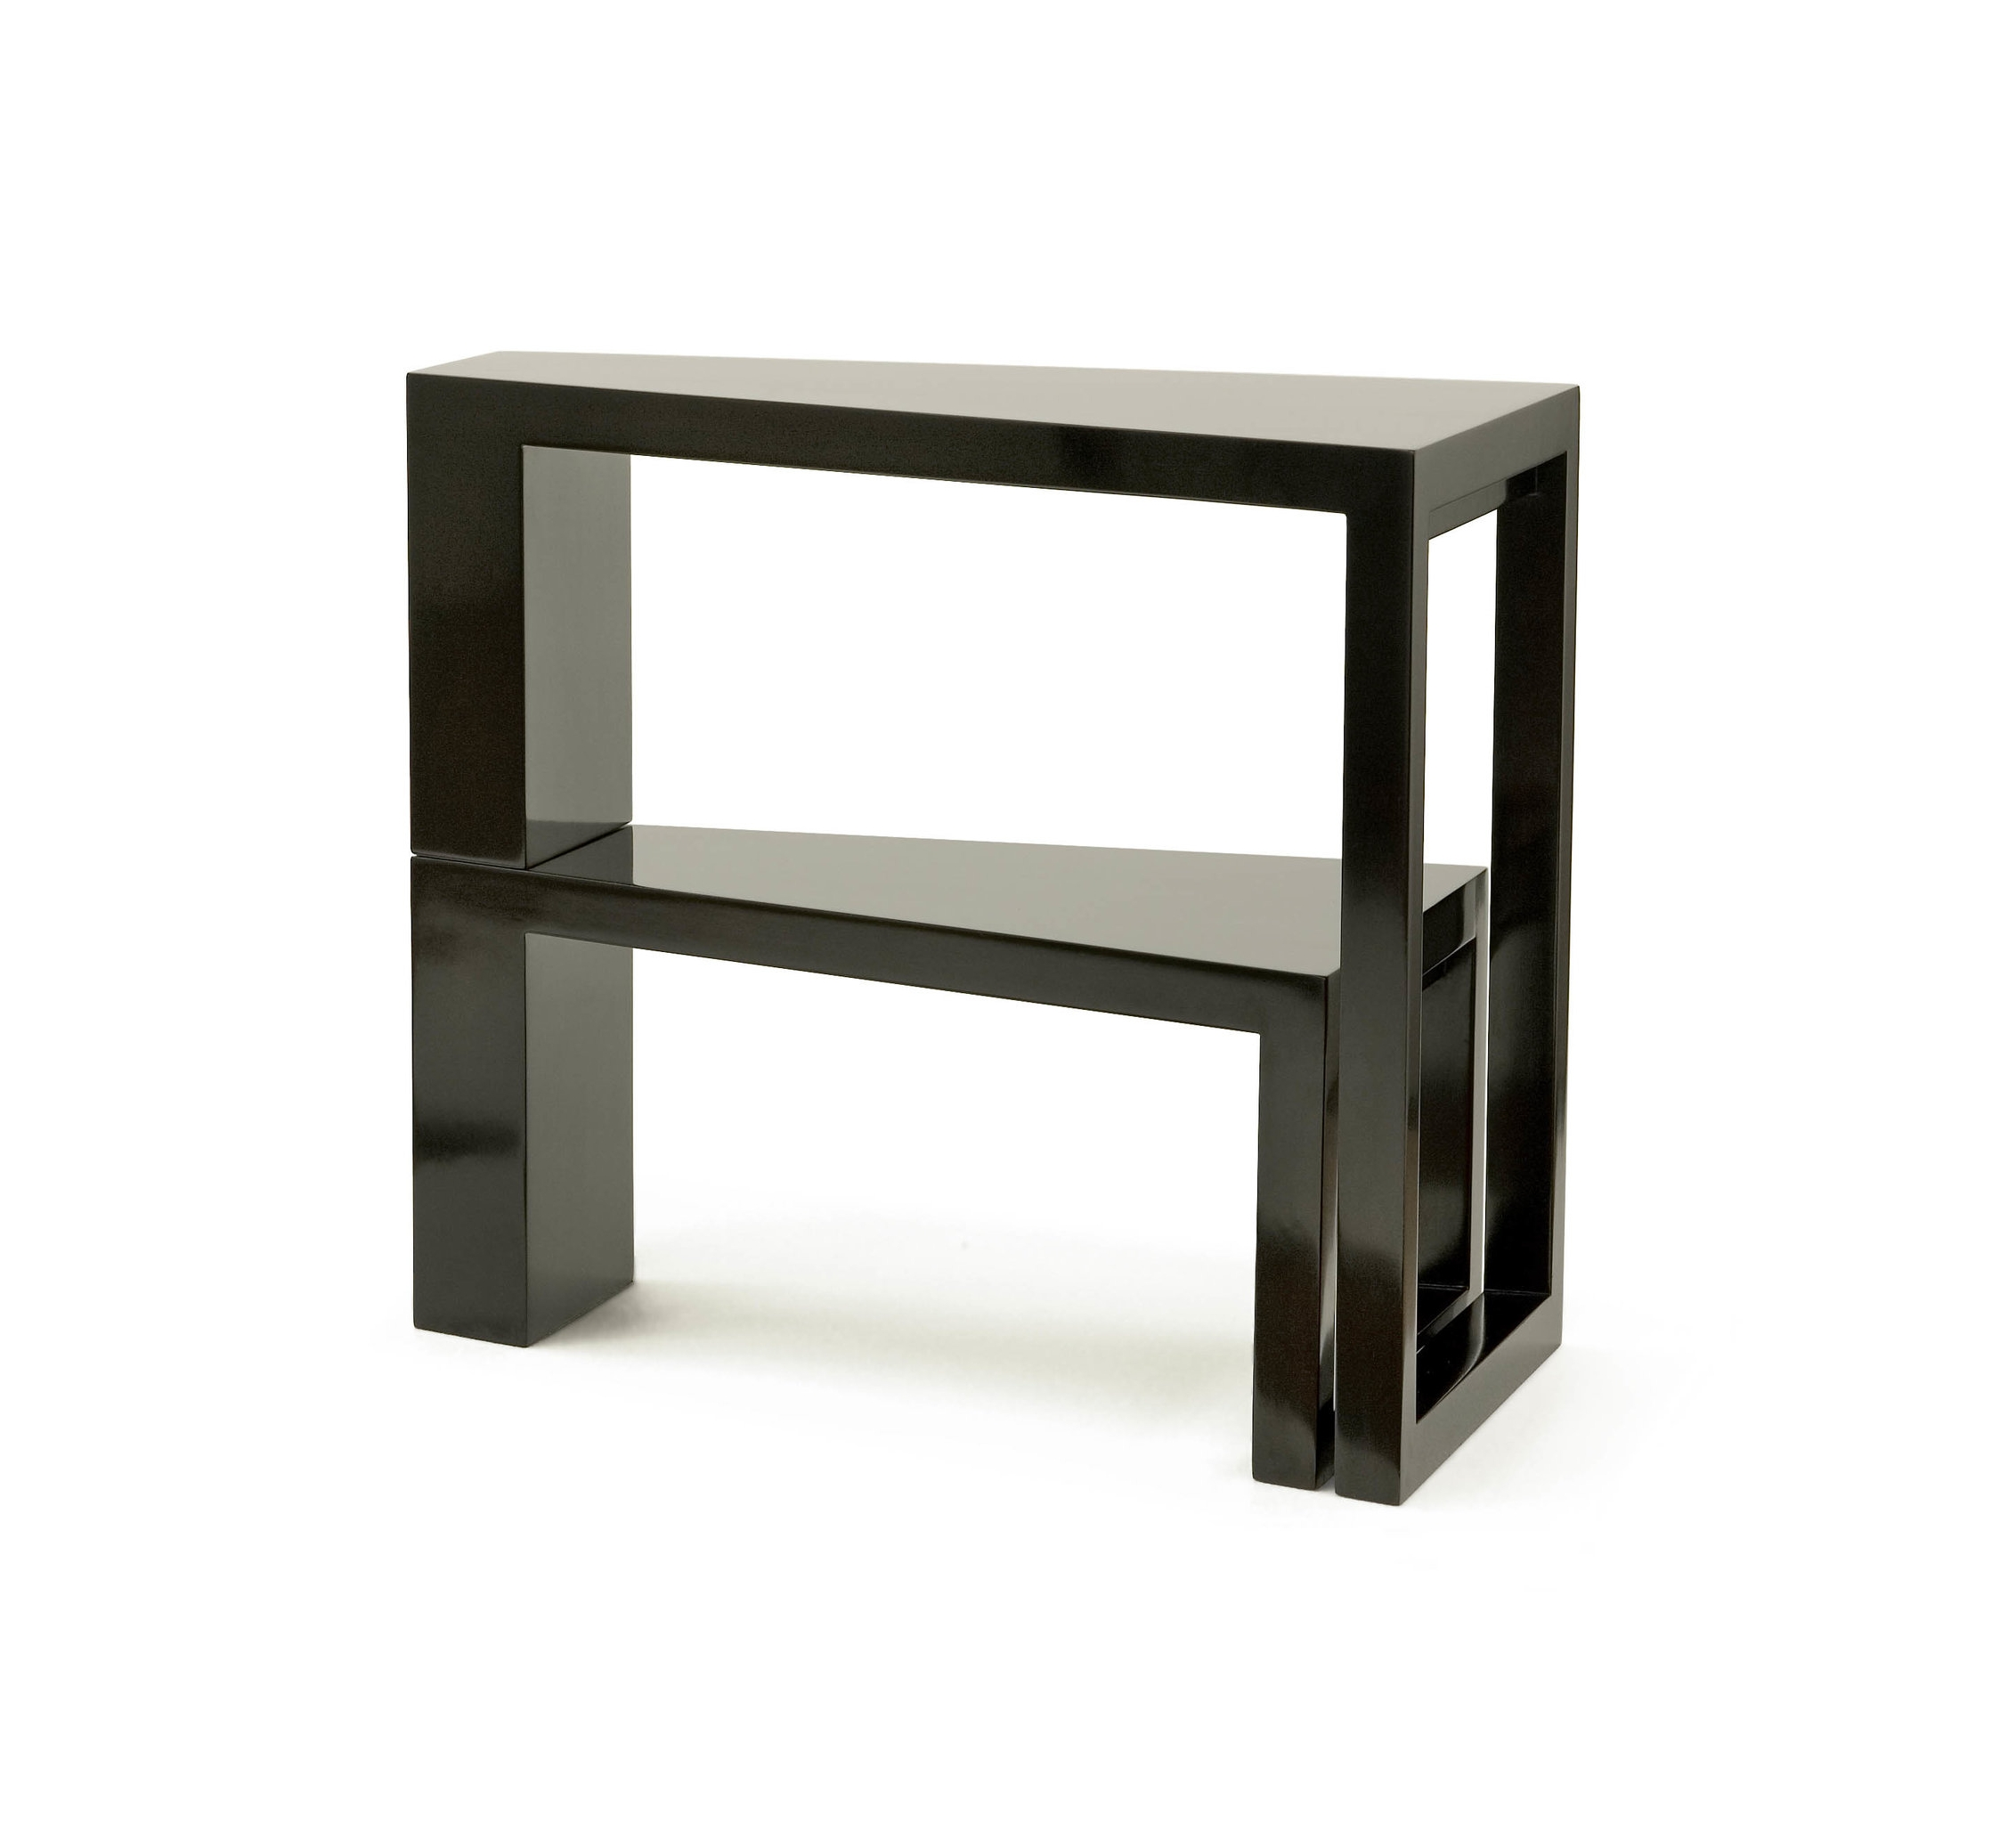 .bespoke modern furniture : steps..特别定制摩登家具 : 台阶....